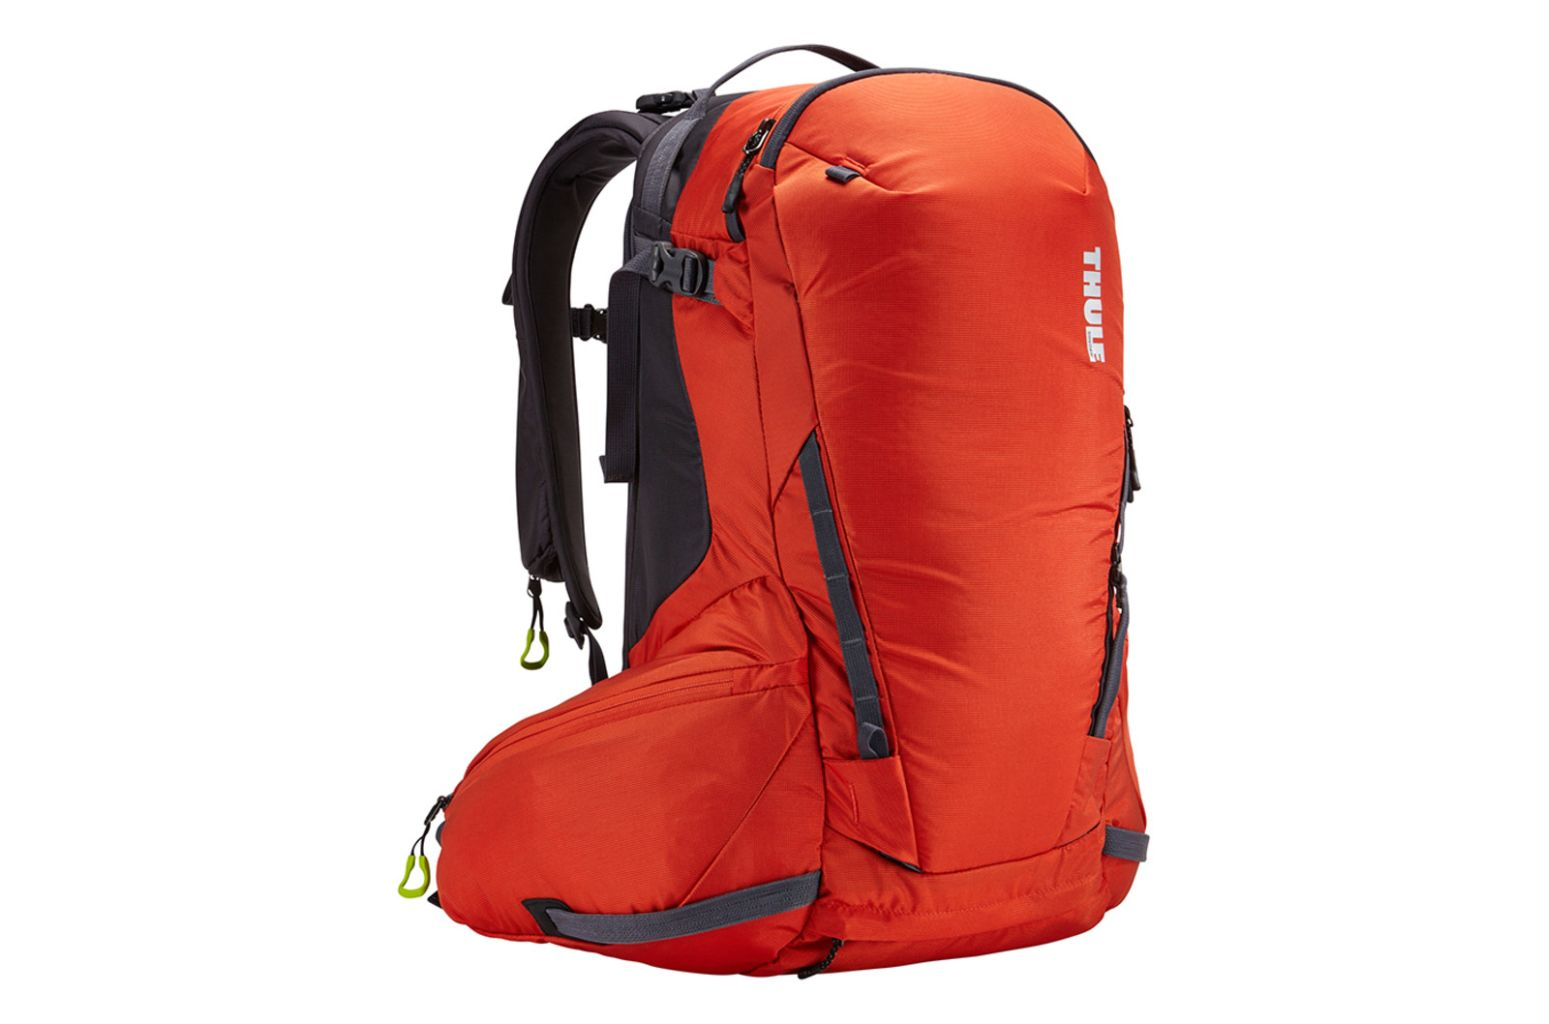 THULE Upslope 35L Backpack Roarange-30